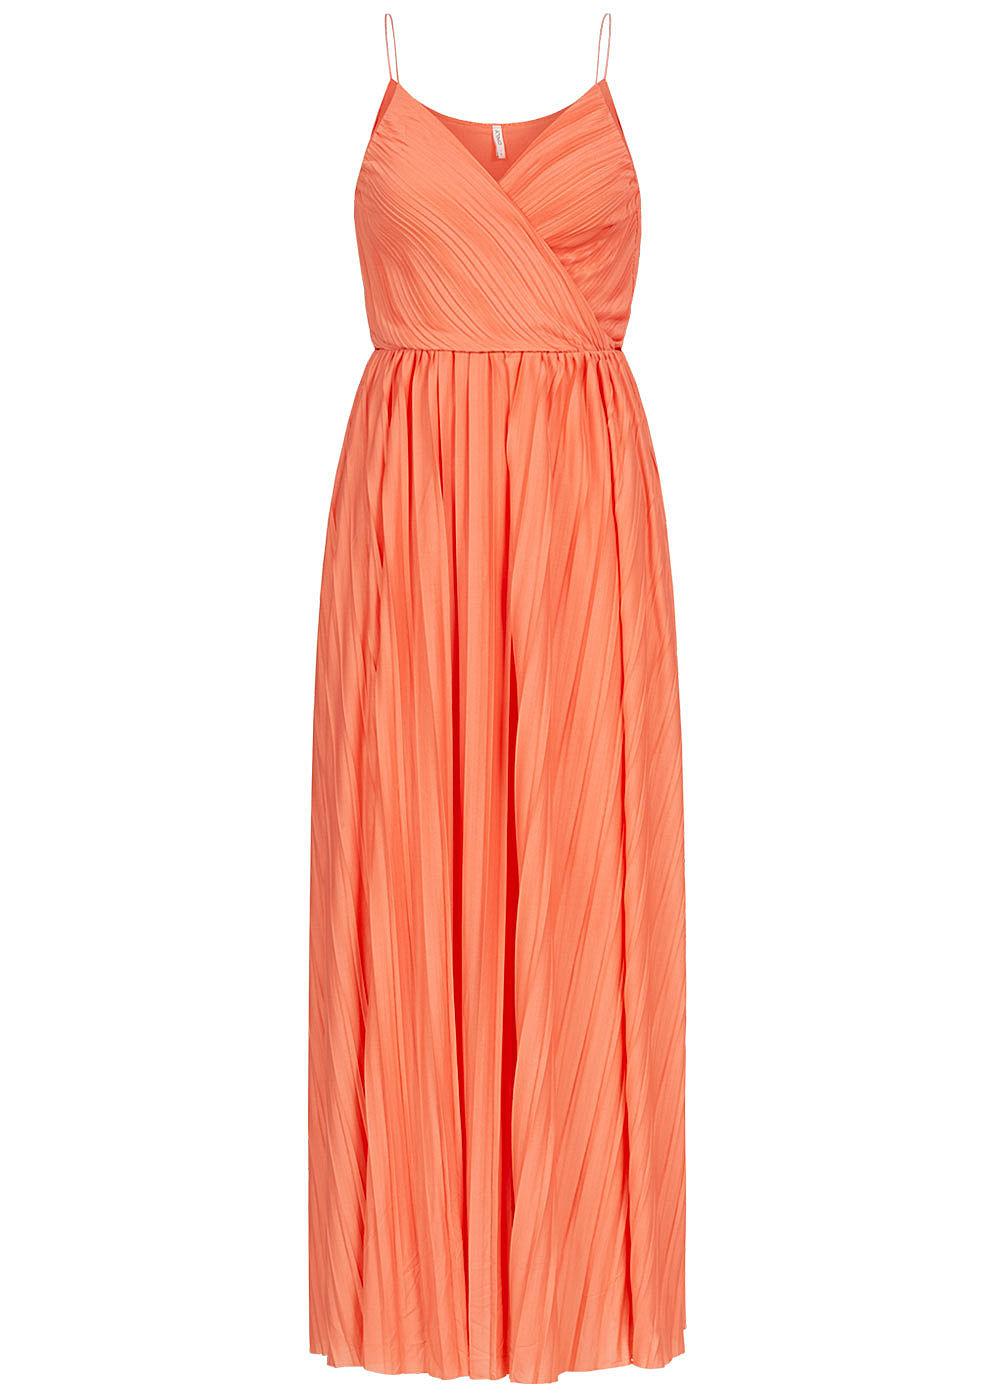 ONLY Damen V-Neck Maxi Kleid Wickeloptik mit Falten 16-lagig terra